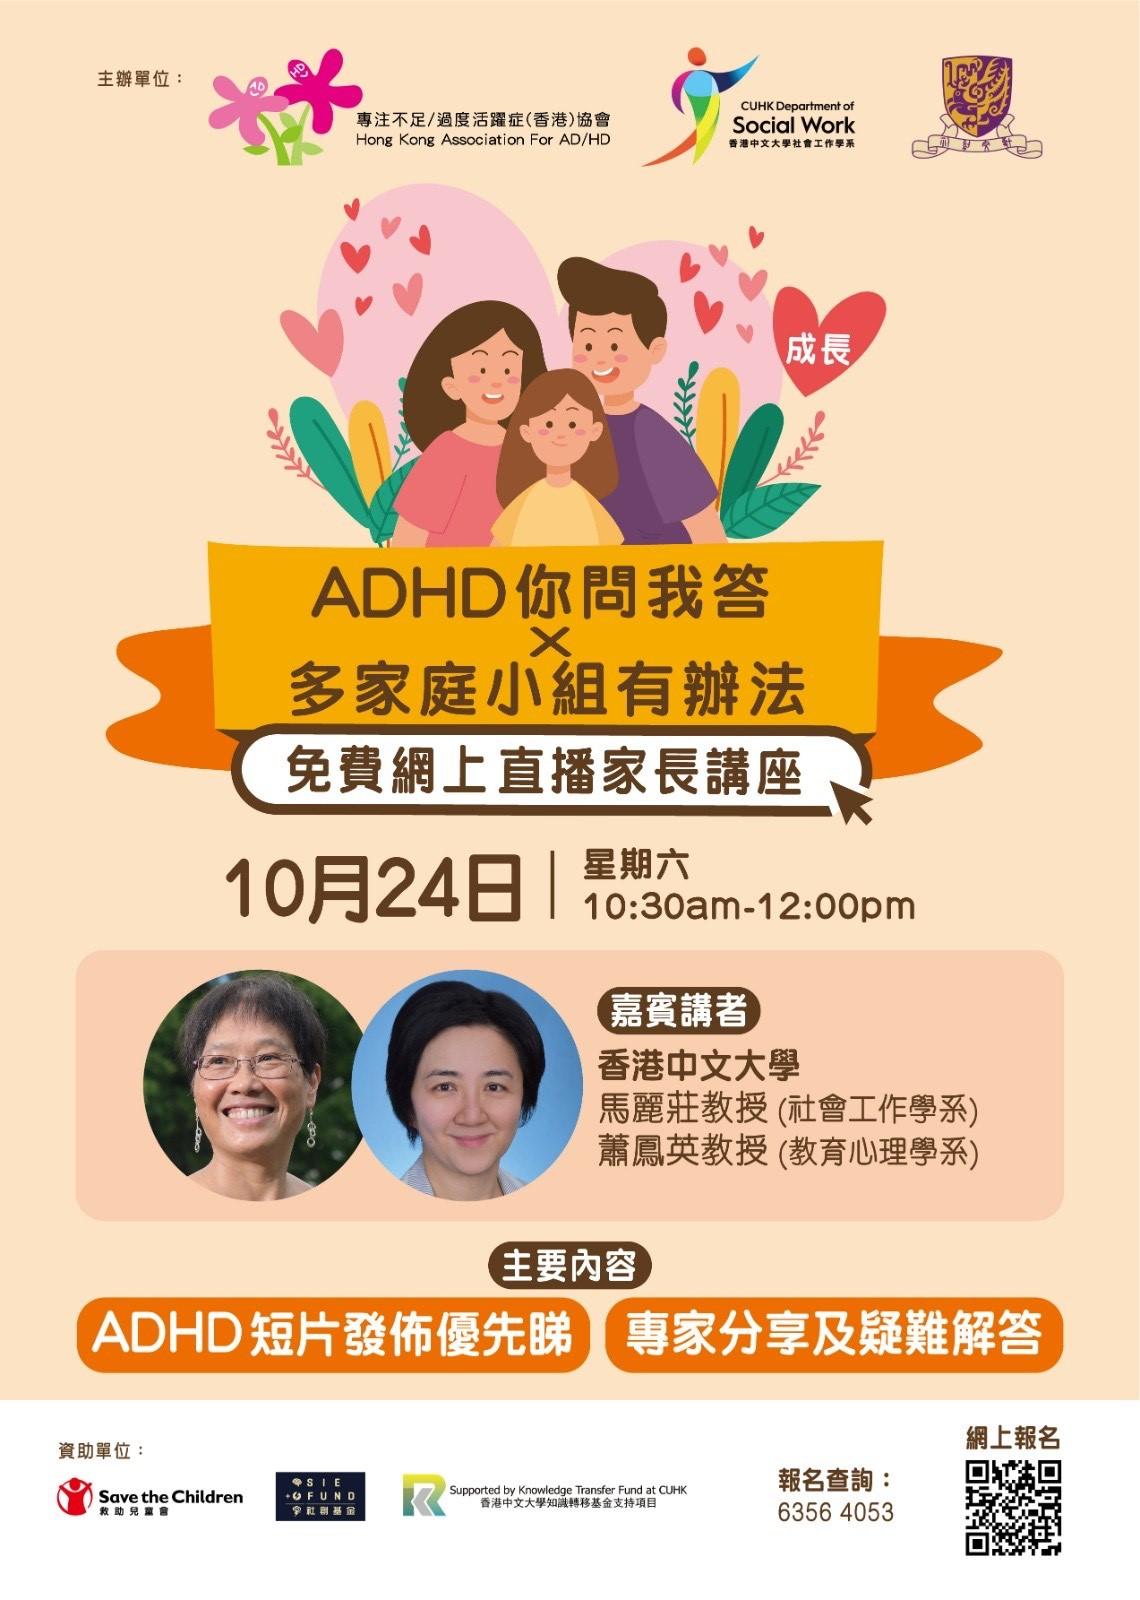 ADHD poster 001